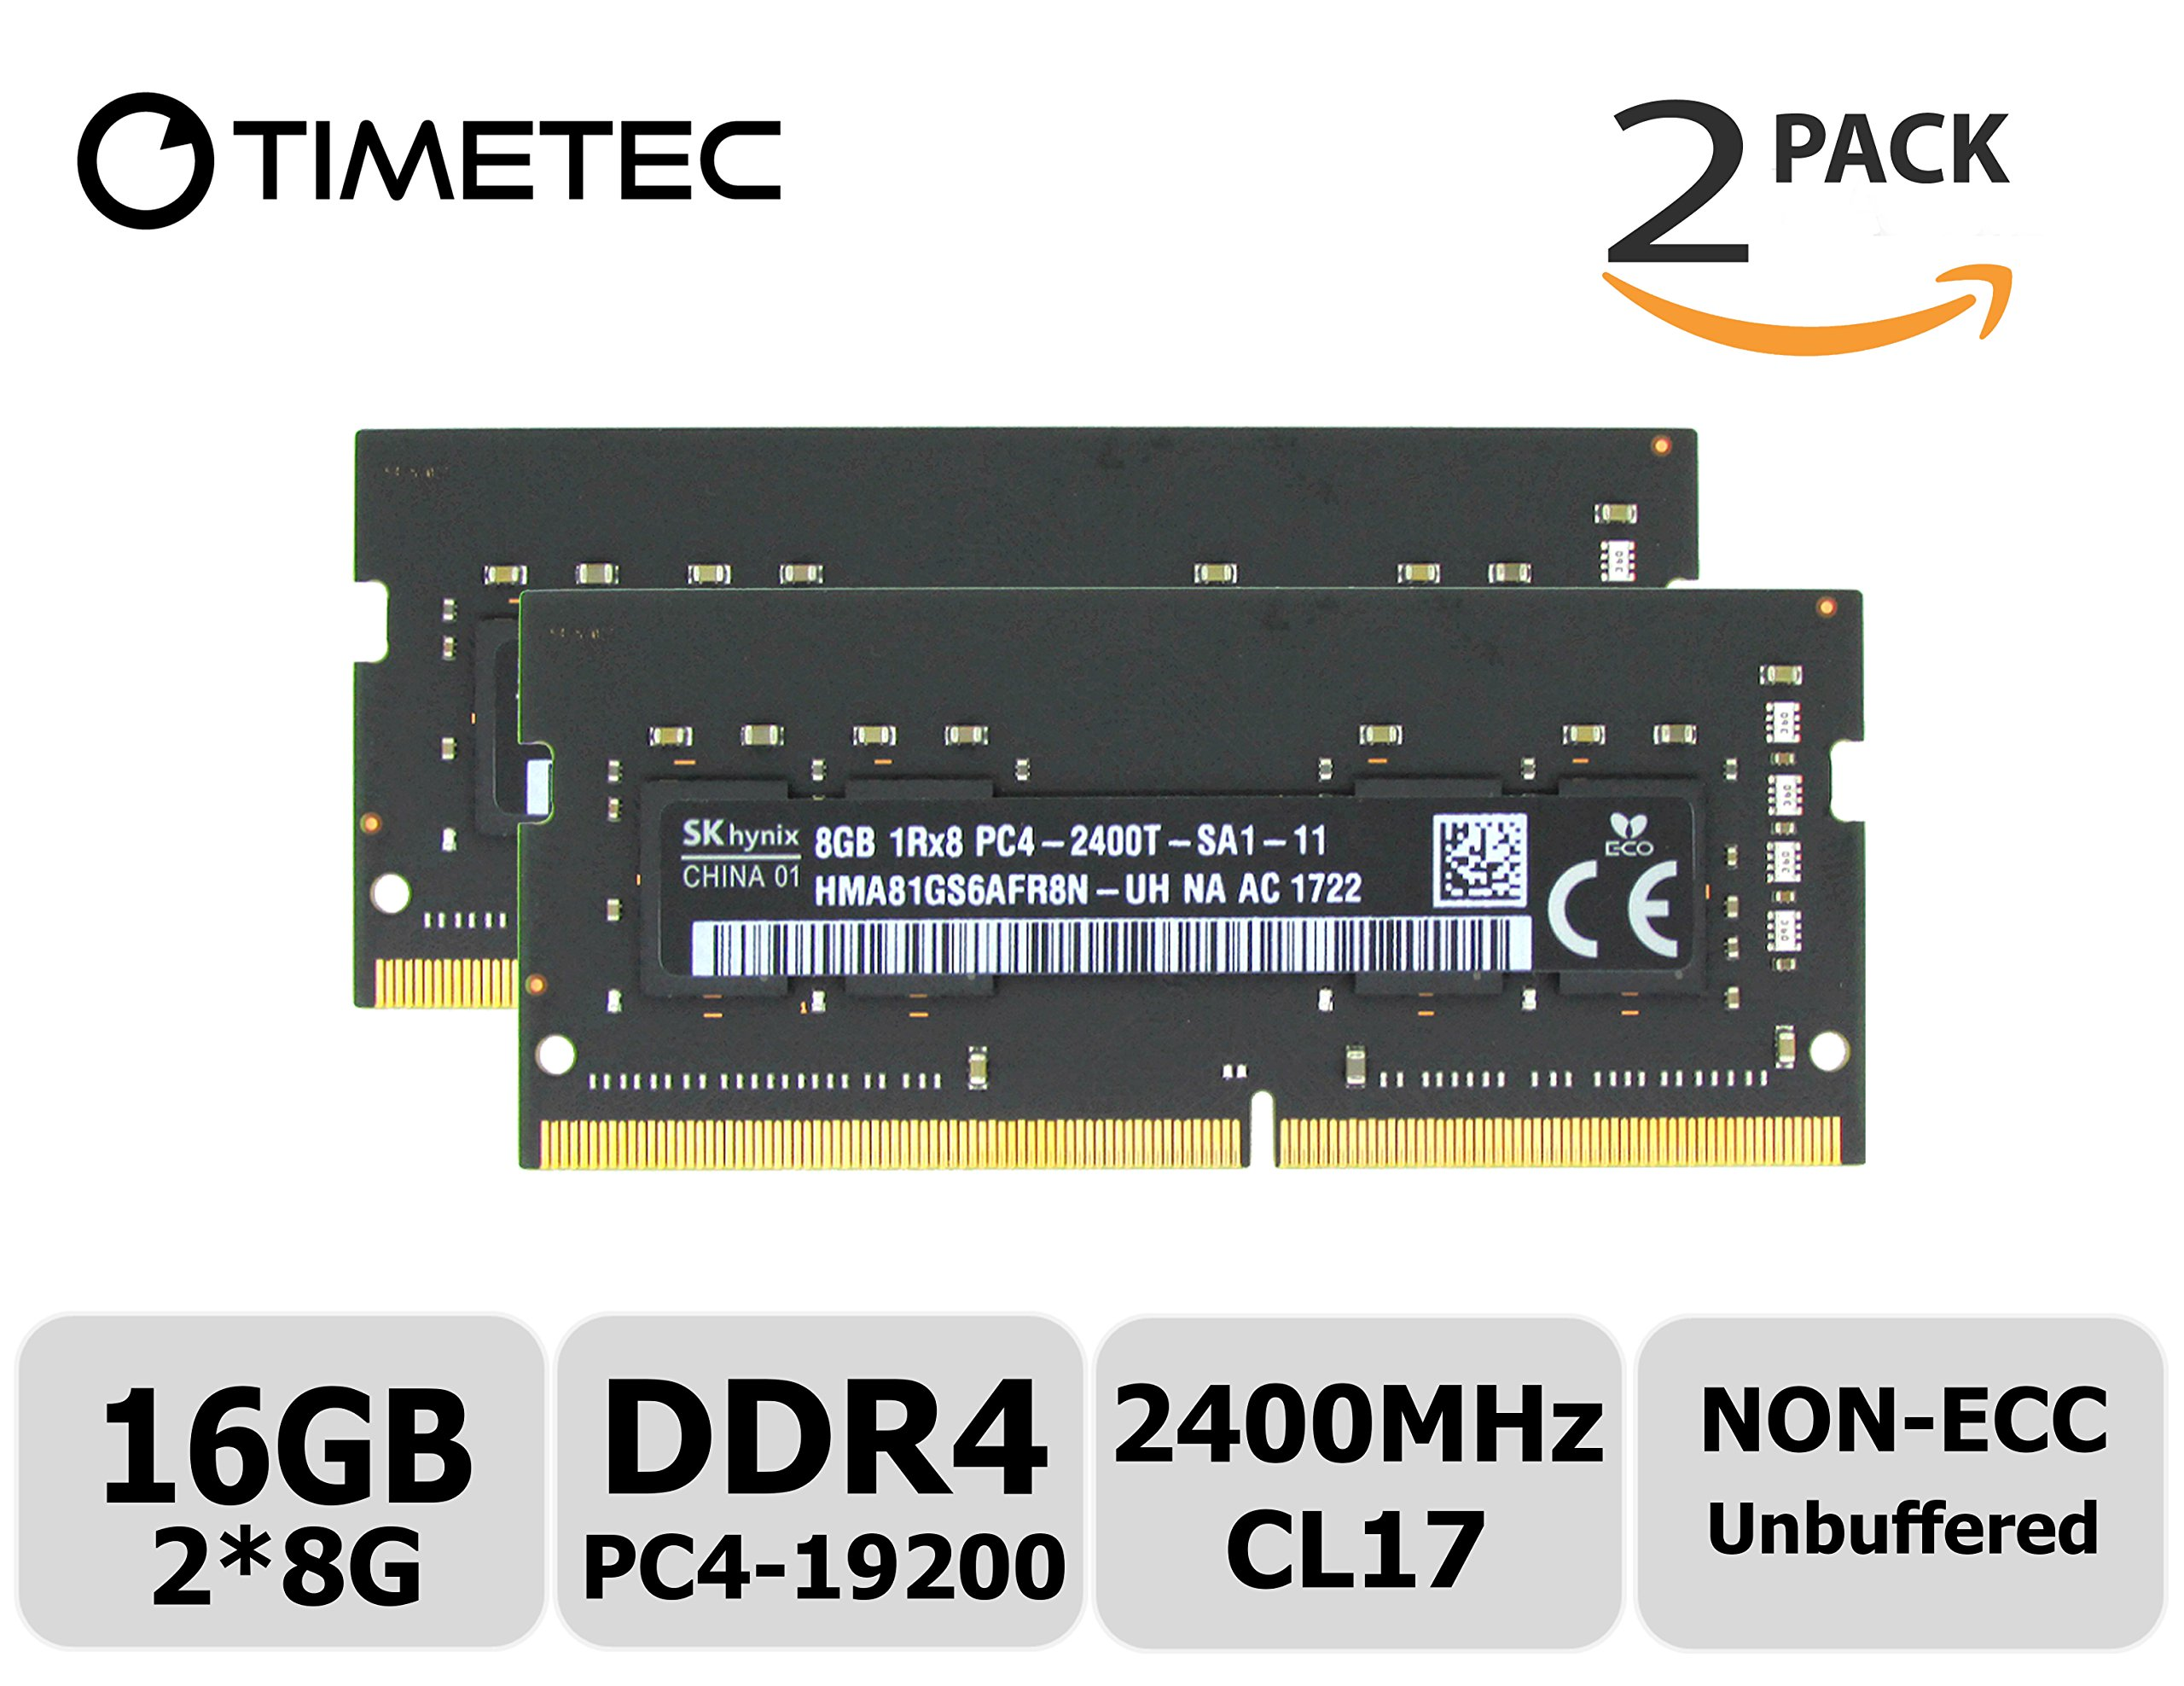 16GB Timetec Hynix IC 16GB DDR4 2400MHz PC4-19200 Non ECC Unbuffered 1.2V CL17 2Rx8 Dual Rank 260 Pin SODIMM Laptop Notebook Computer Memory Ram Module Upgrade